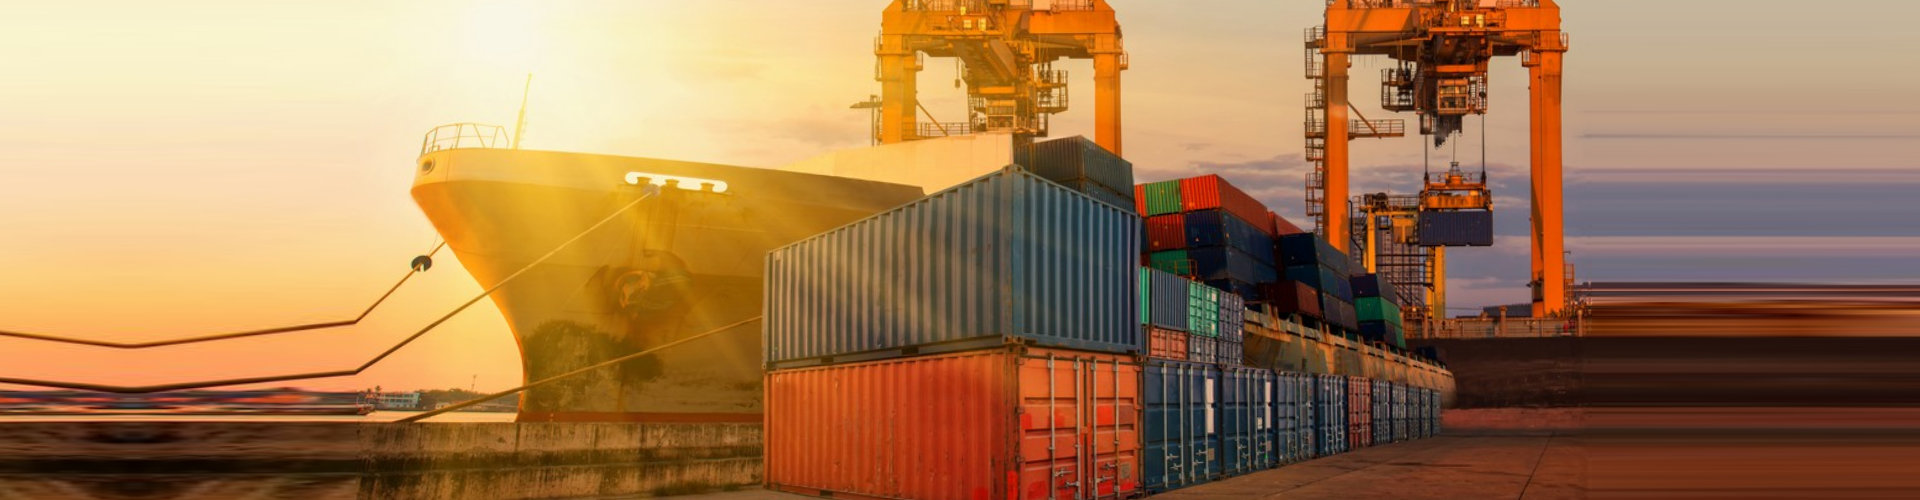 cargo ship docked on port